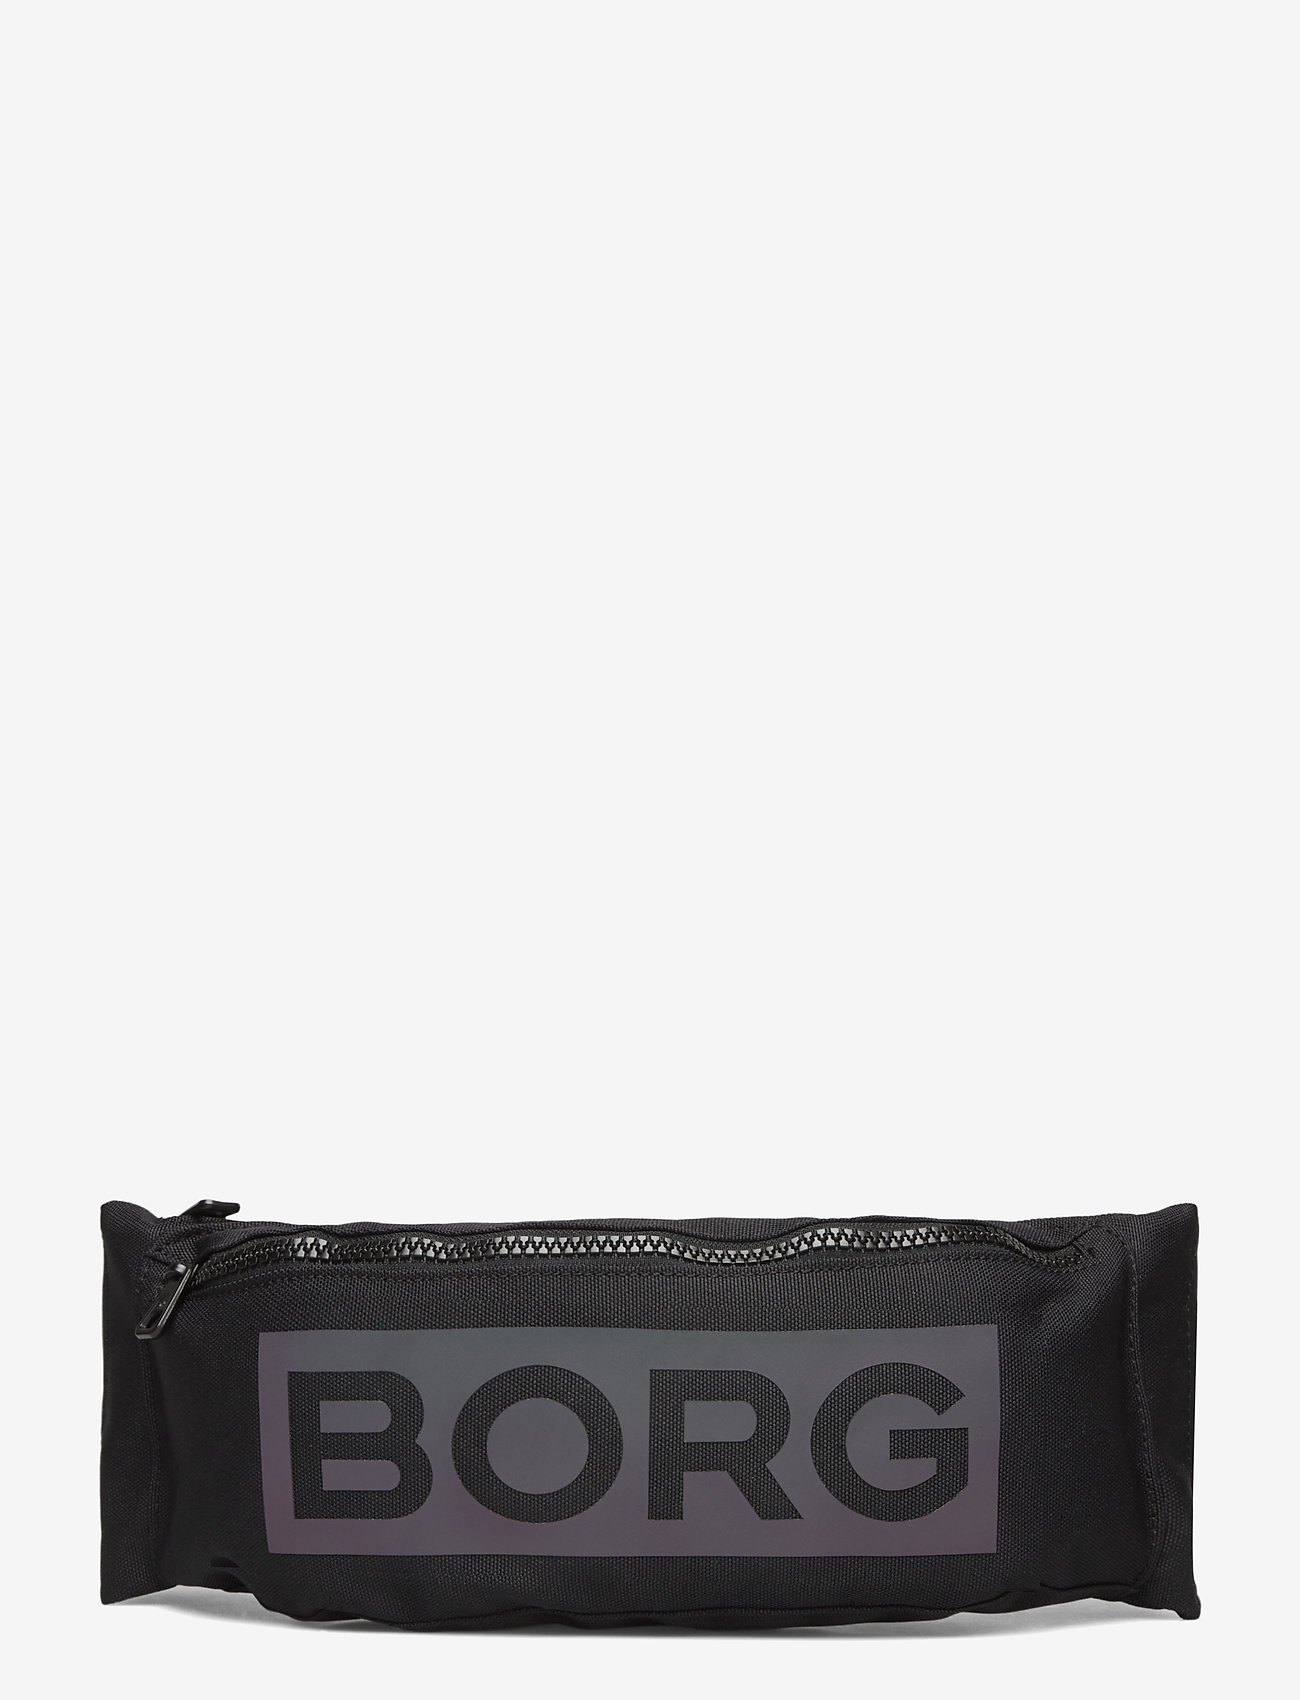 Björn Borg - VAN - bum bags - black - 0